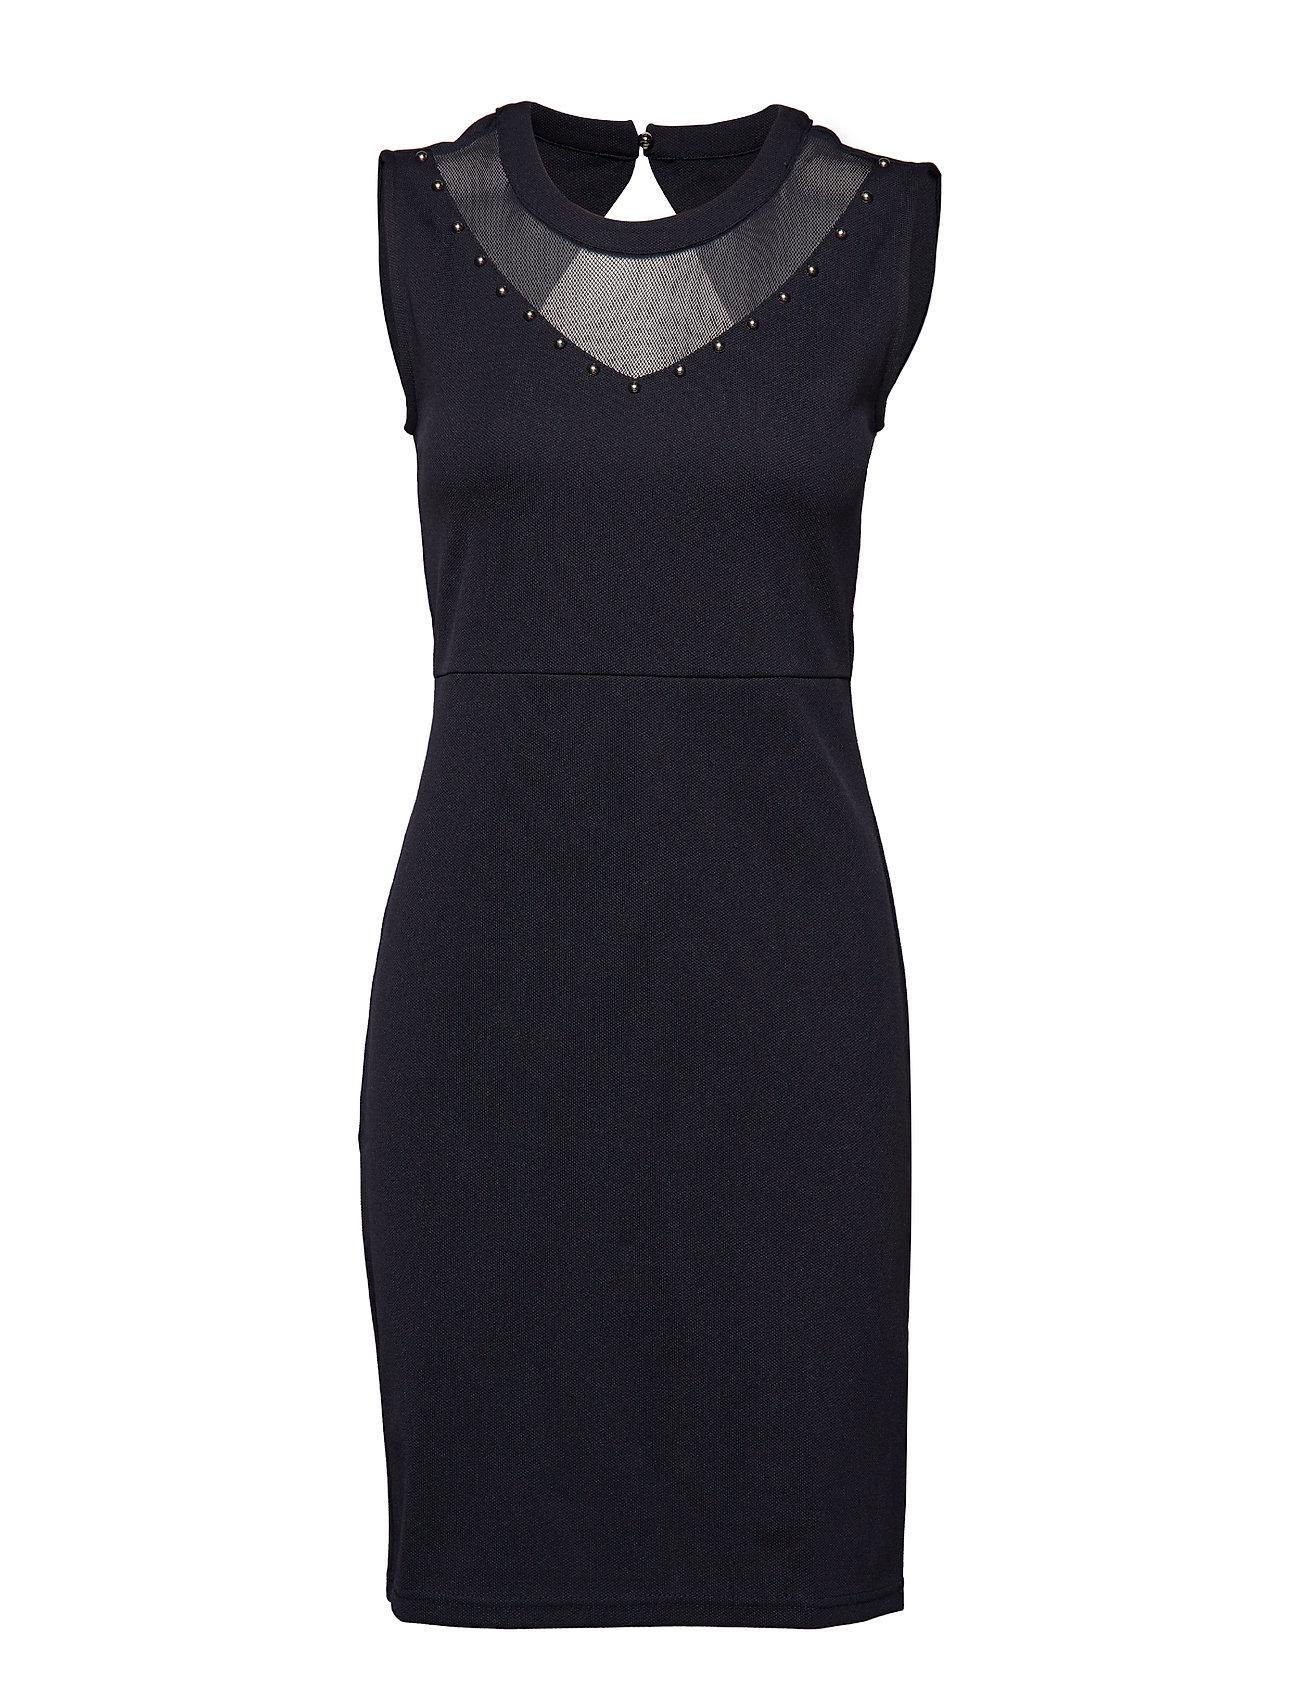 Kaffe KAlucy Dress - MIDNIGHT MARINE